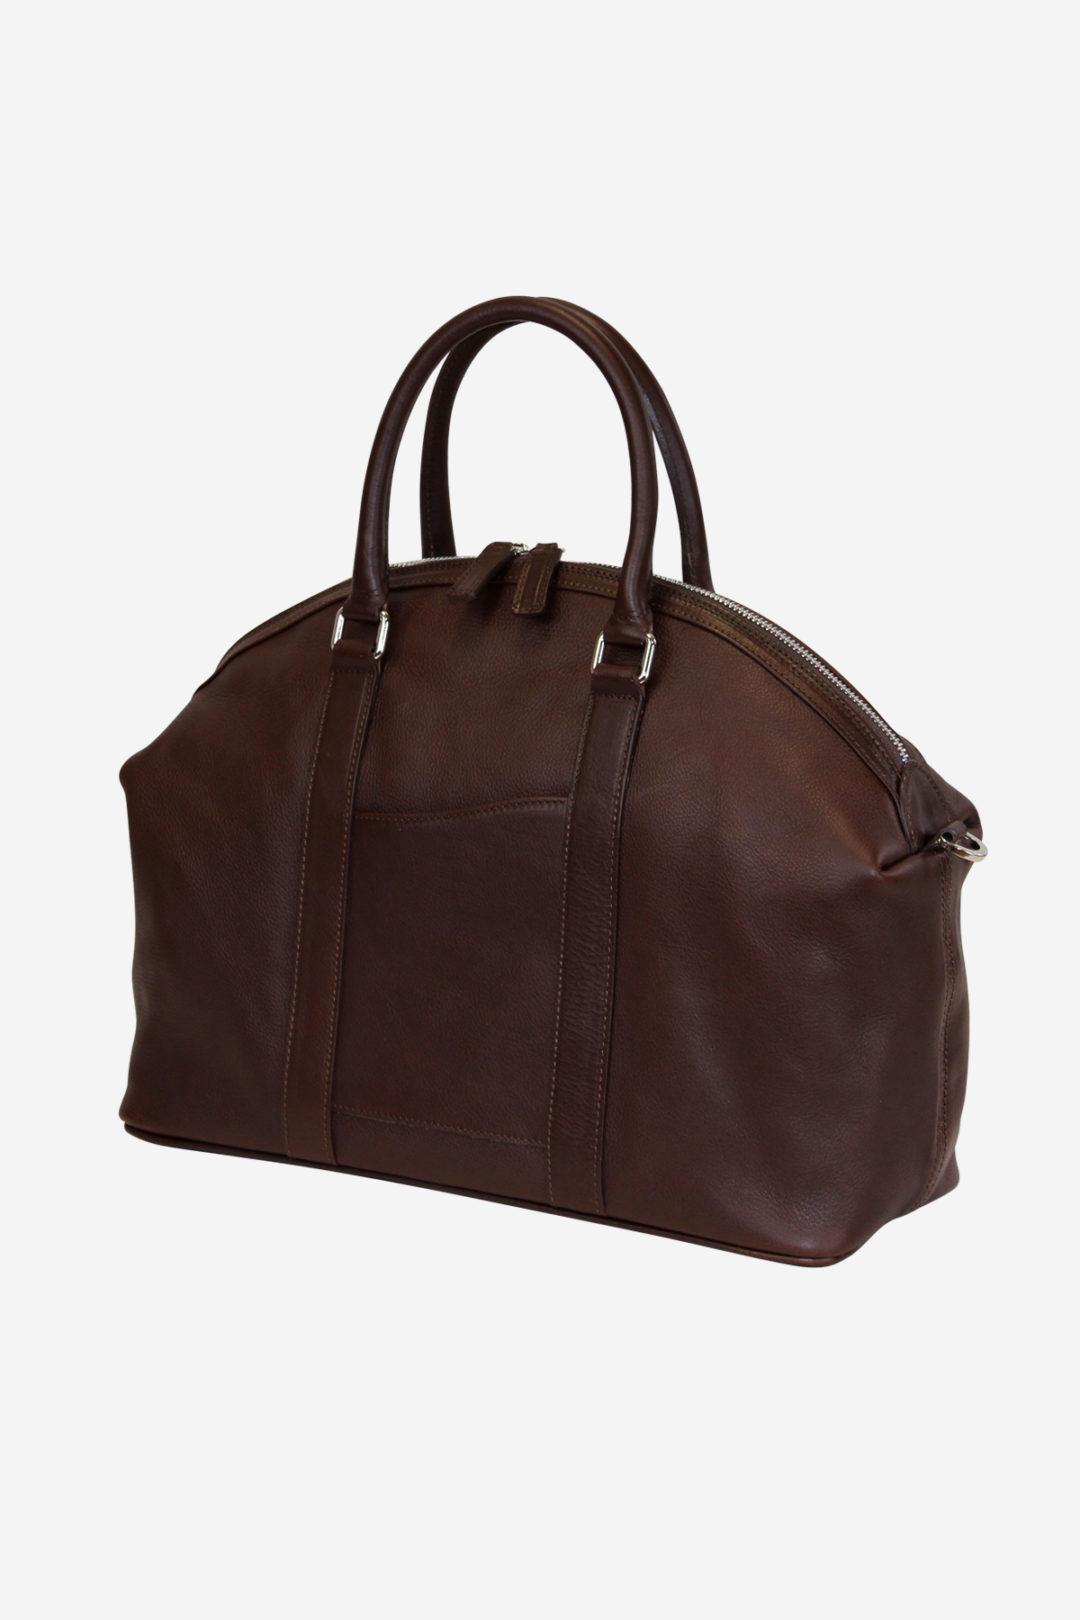 Chapel Bag handmade in italy vegetable tanned leather italian bags terrida venezia business fashion